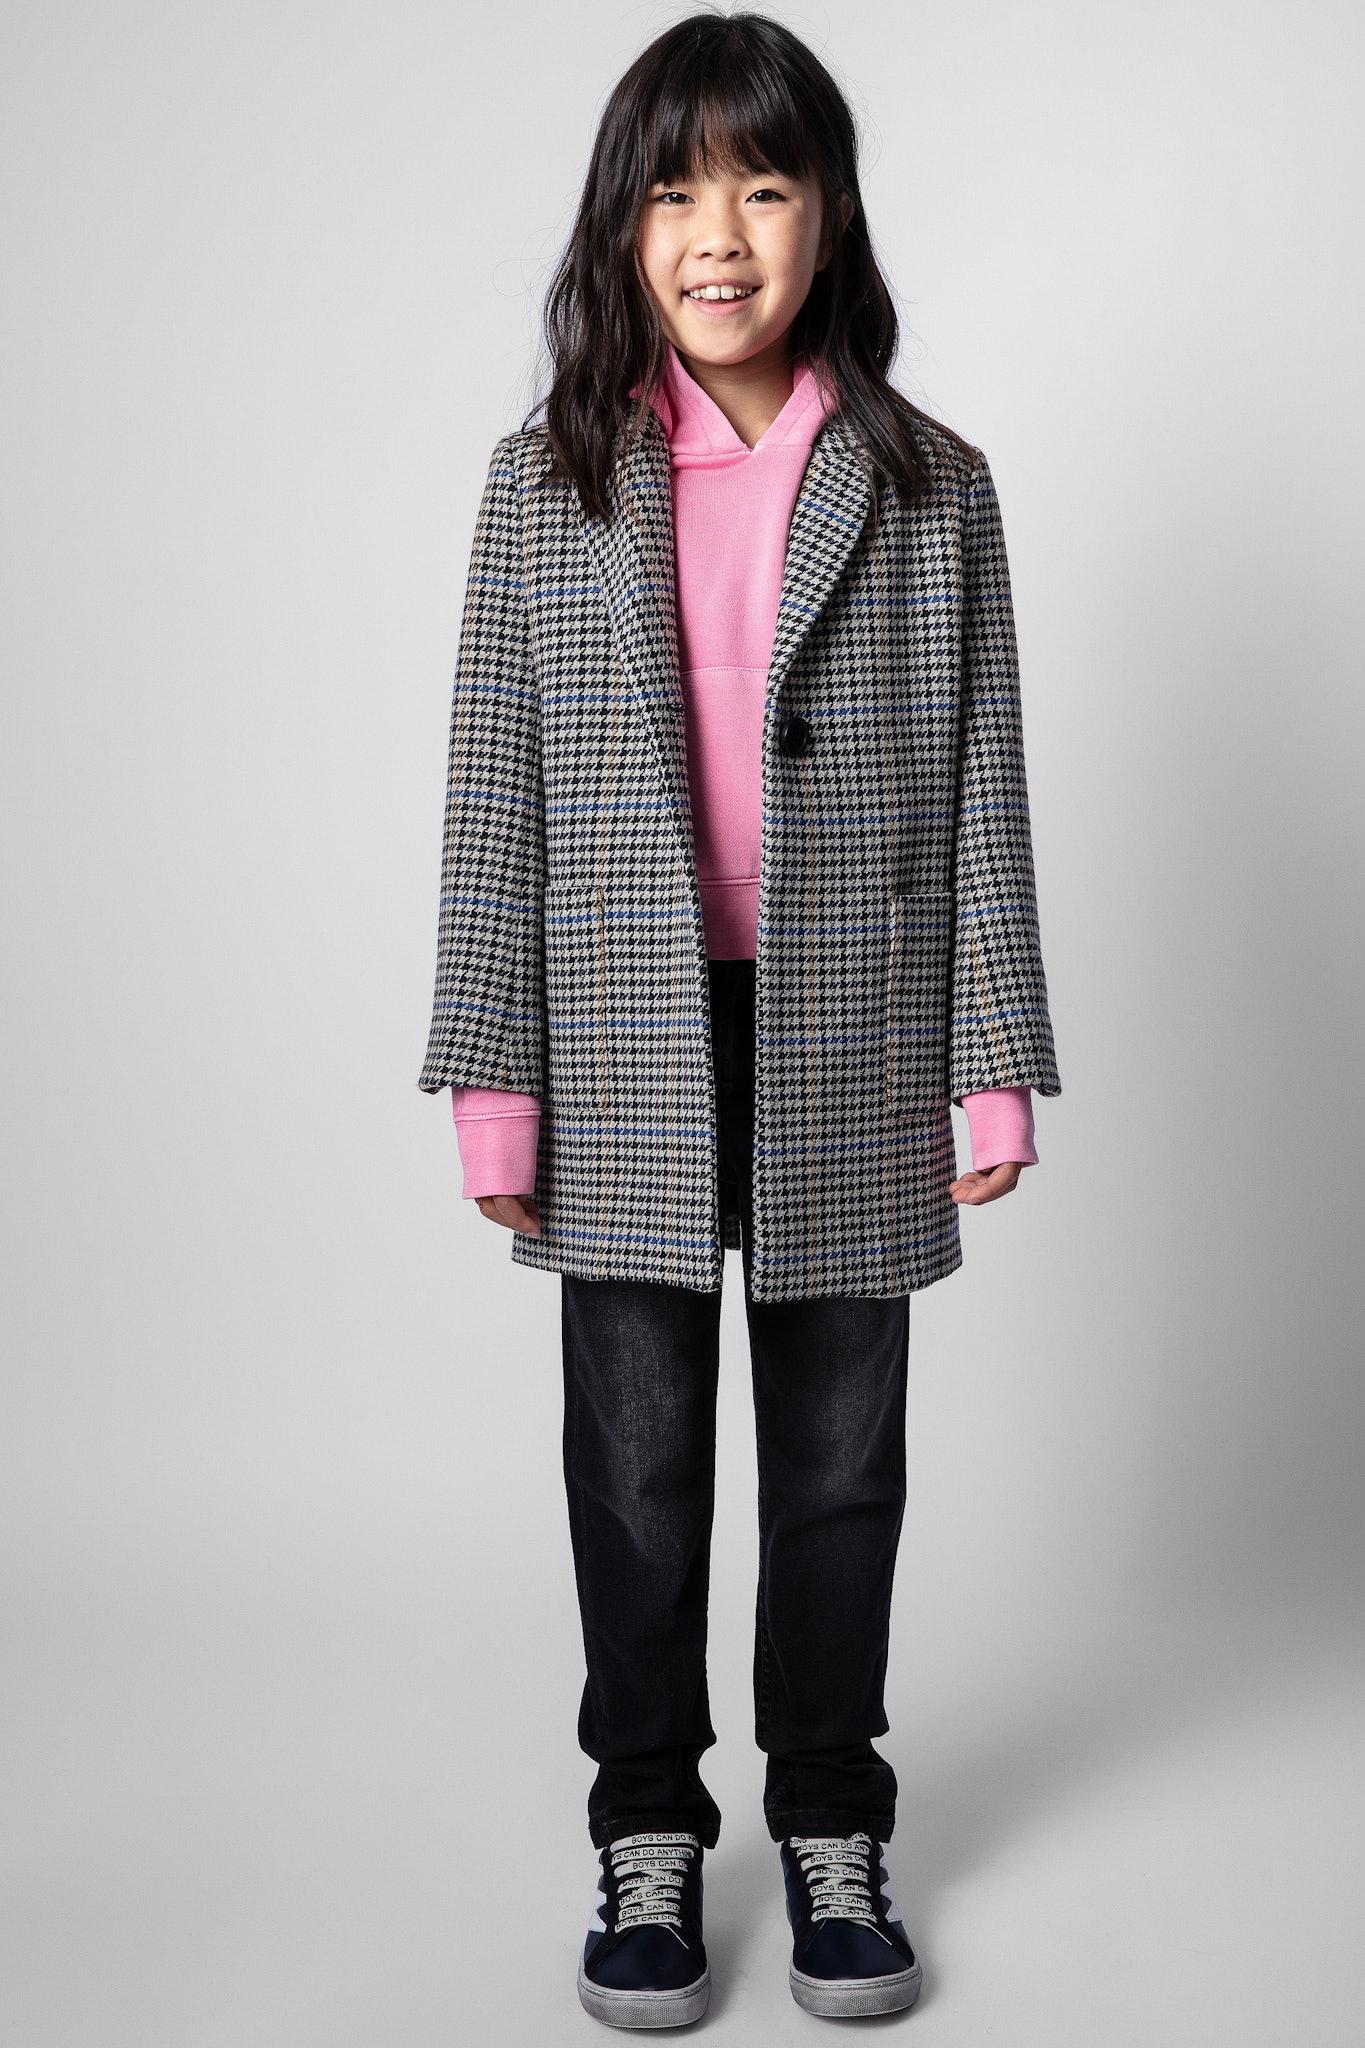 Marylin Enfant Coat